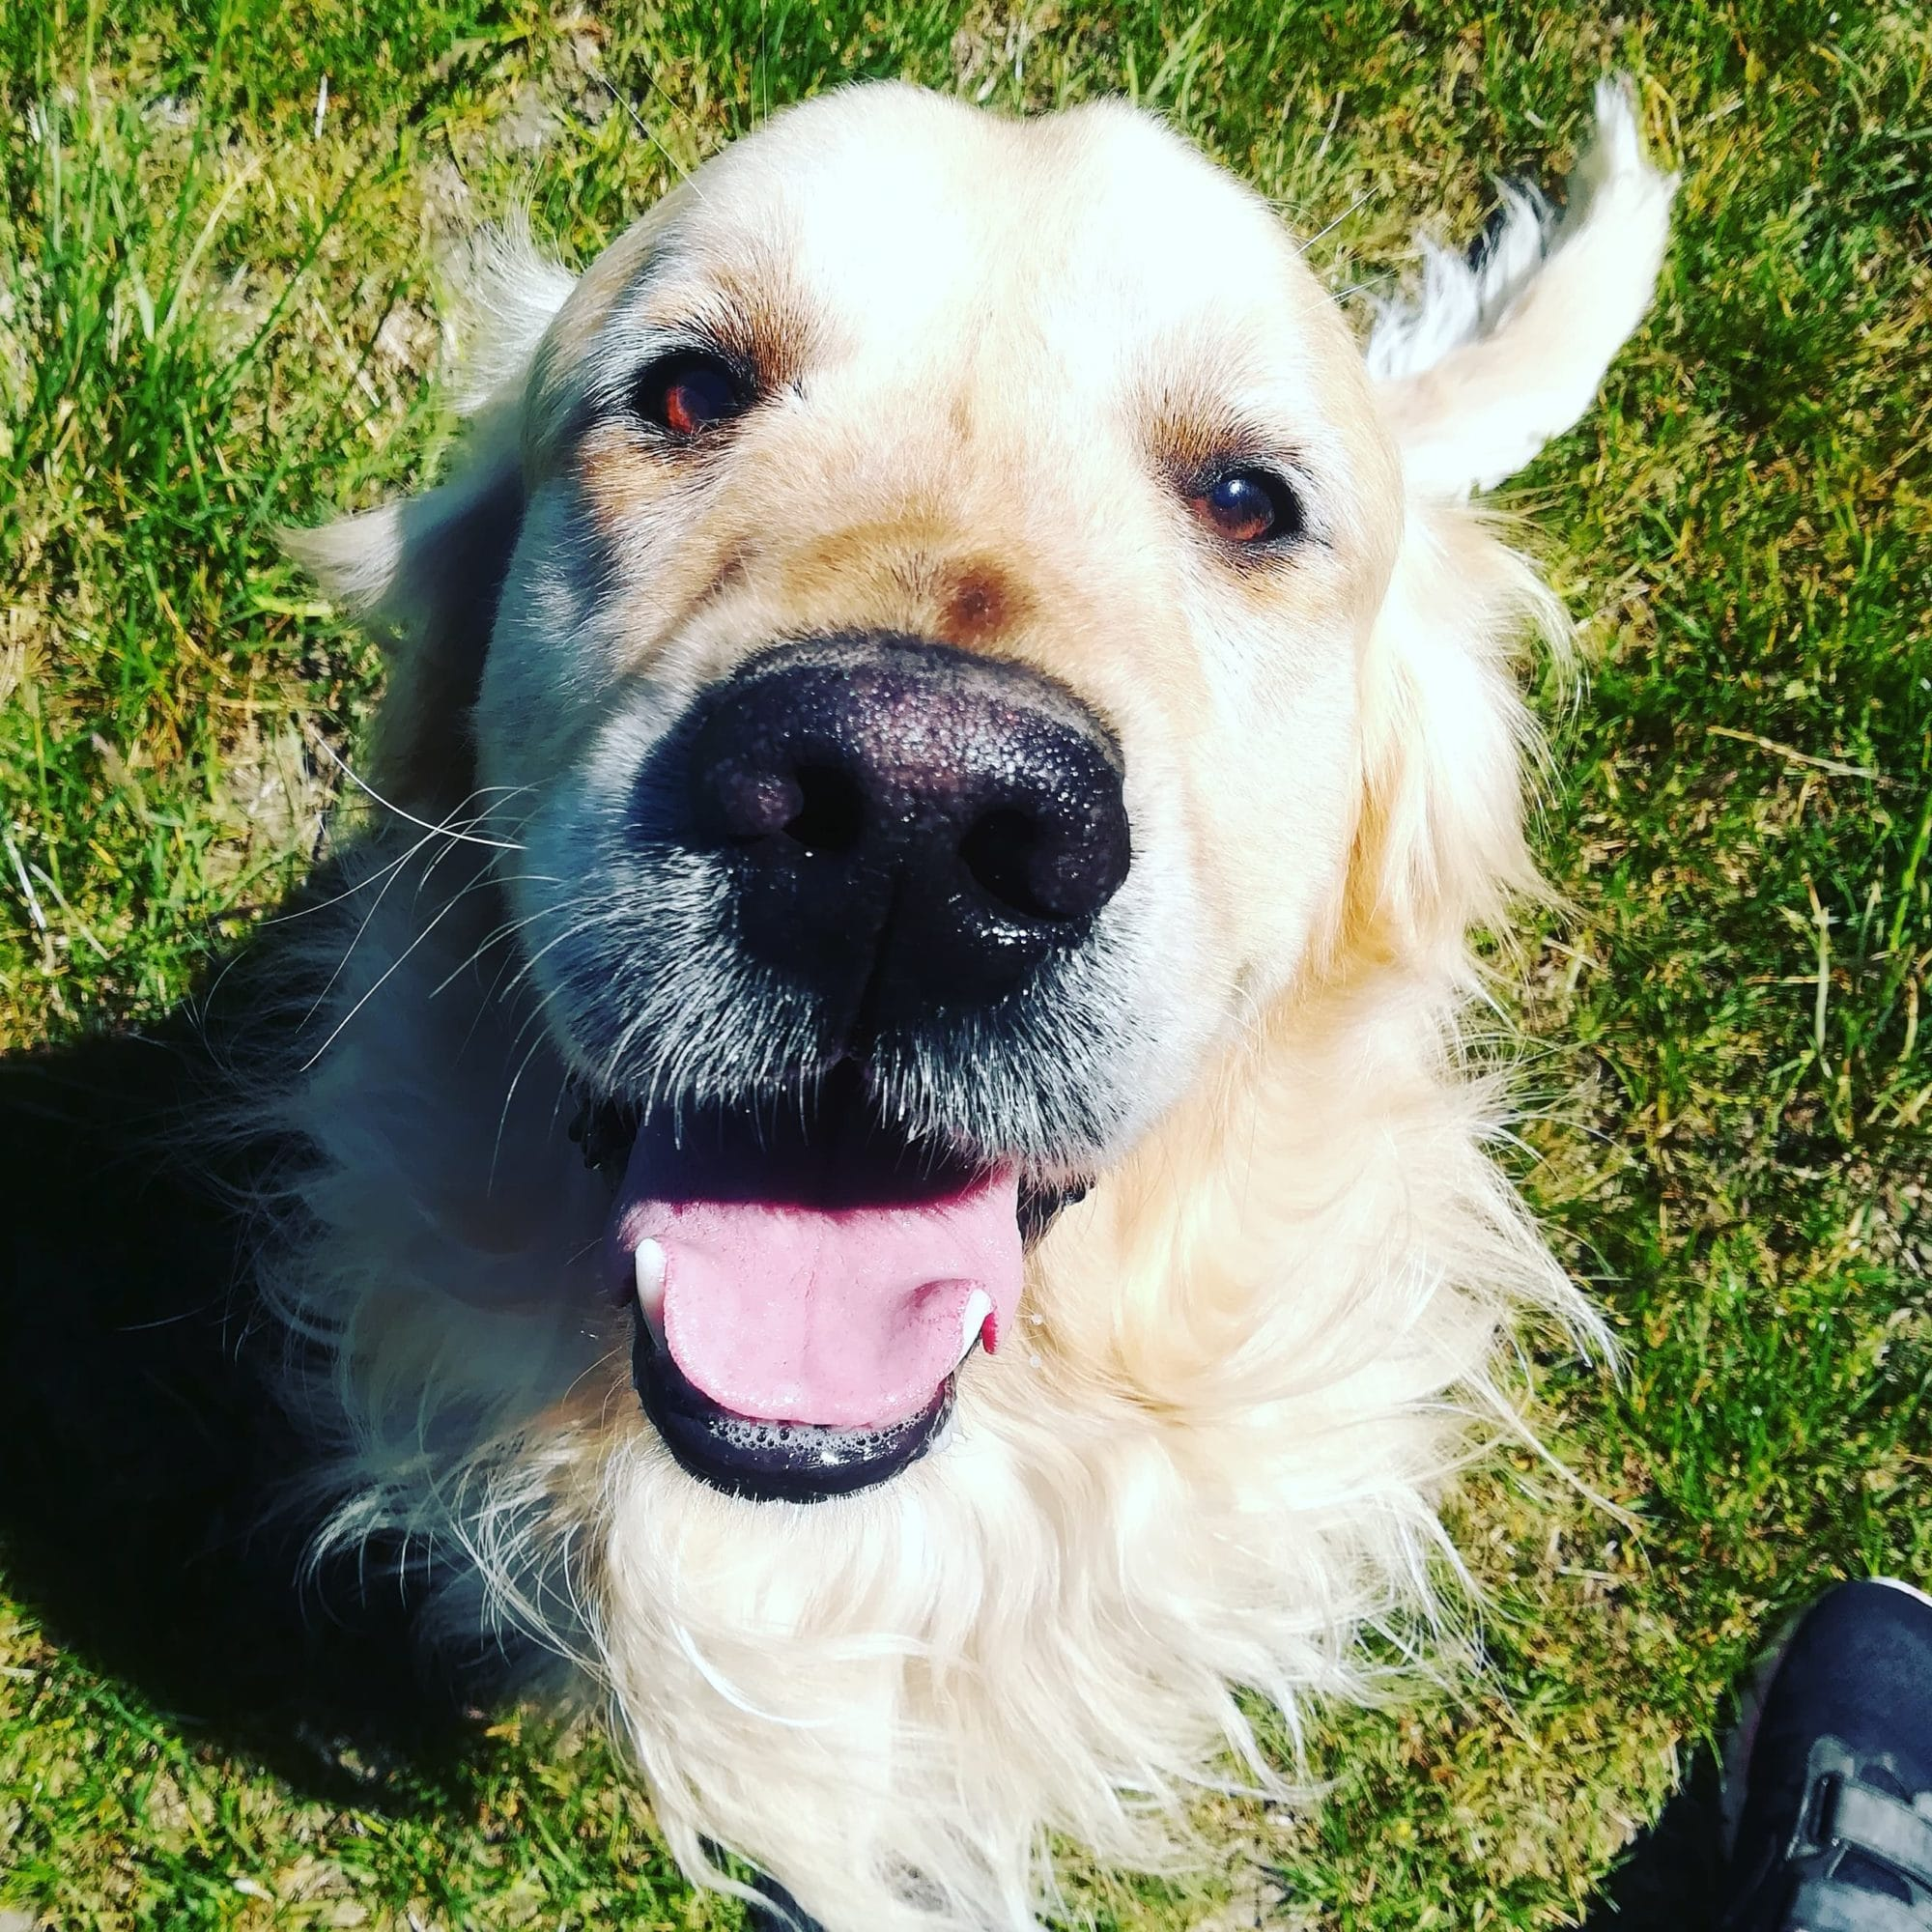 Heross, chien de médiation animale